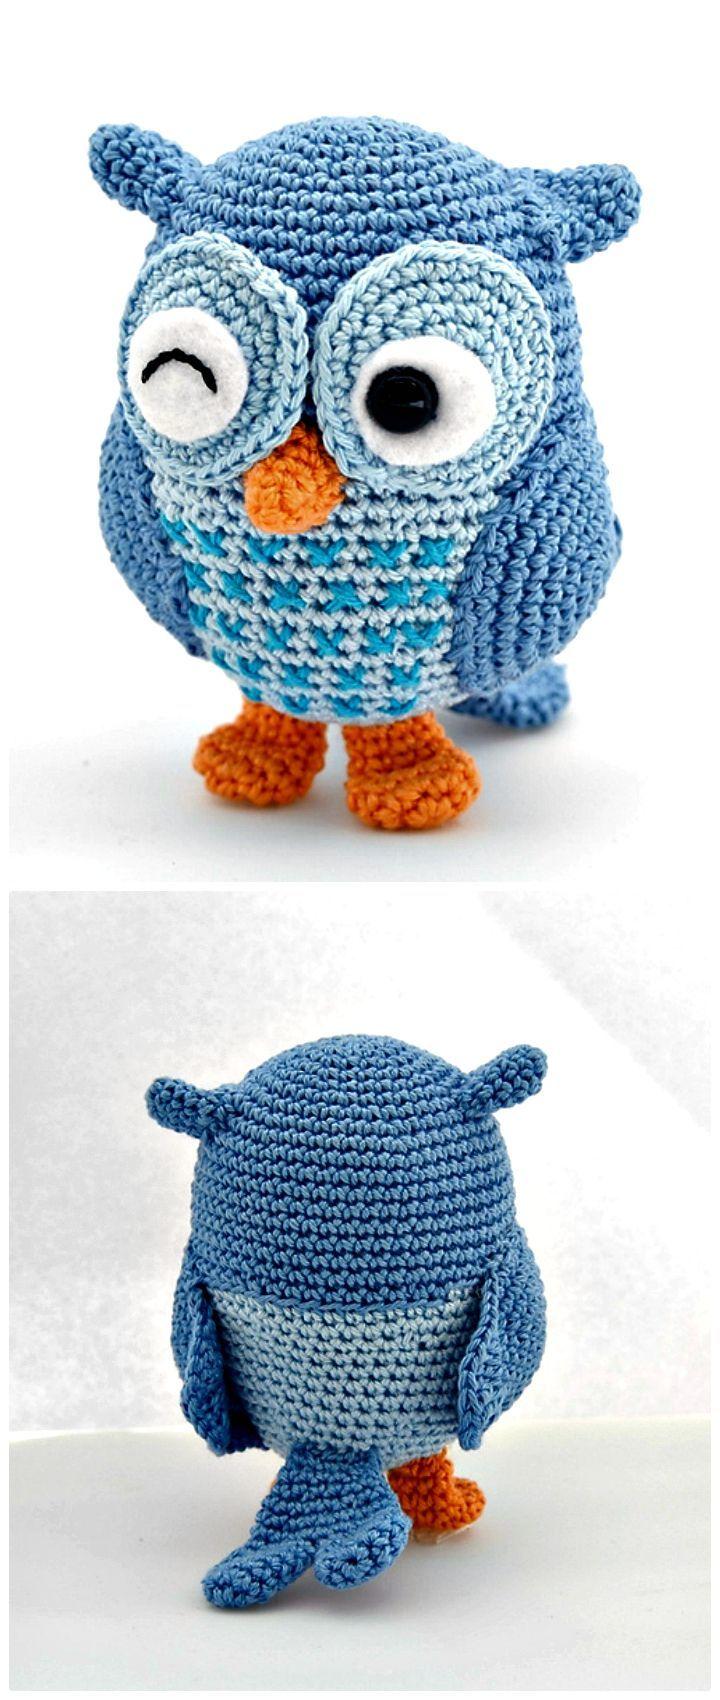 Crochet Amigurumi - 225 Free Crochet Amigurumi Patterns | Pinterest ...